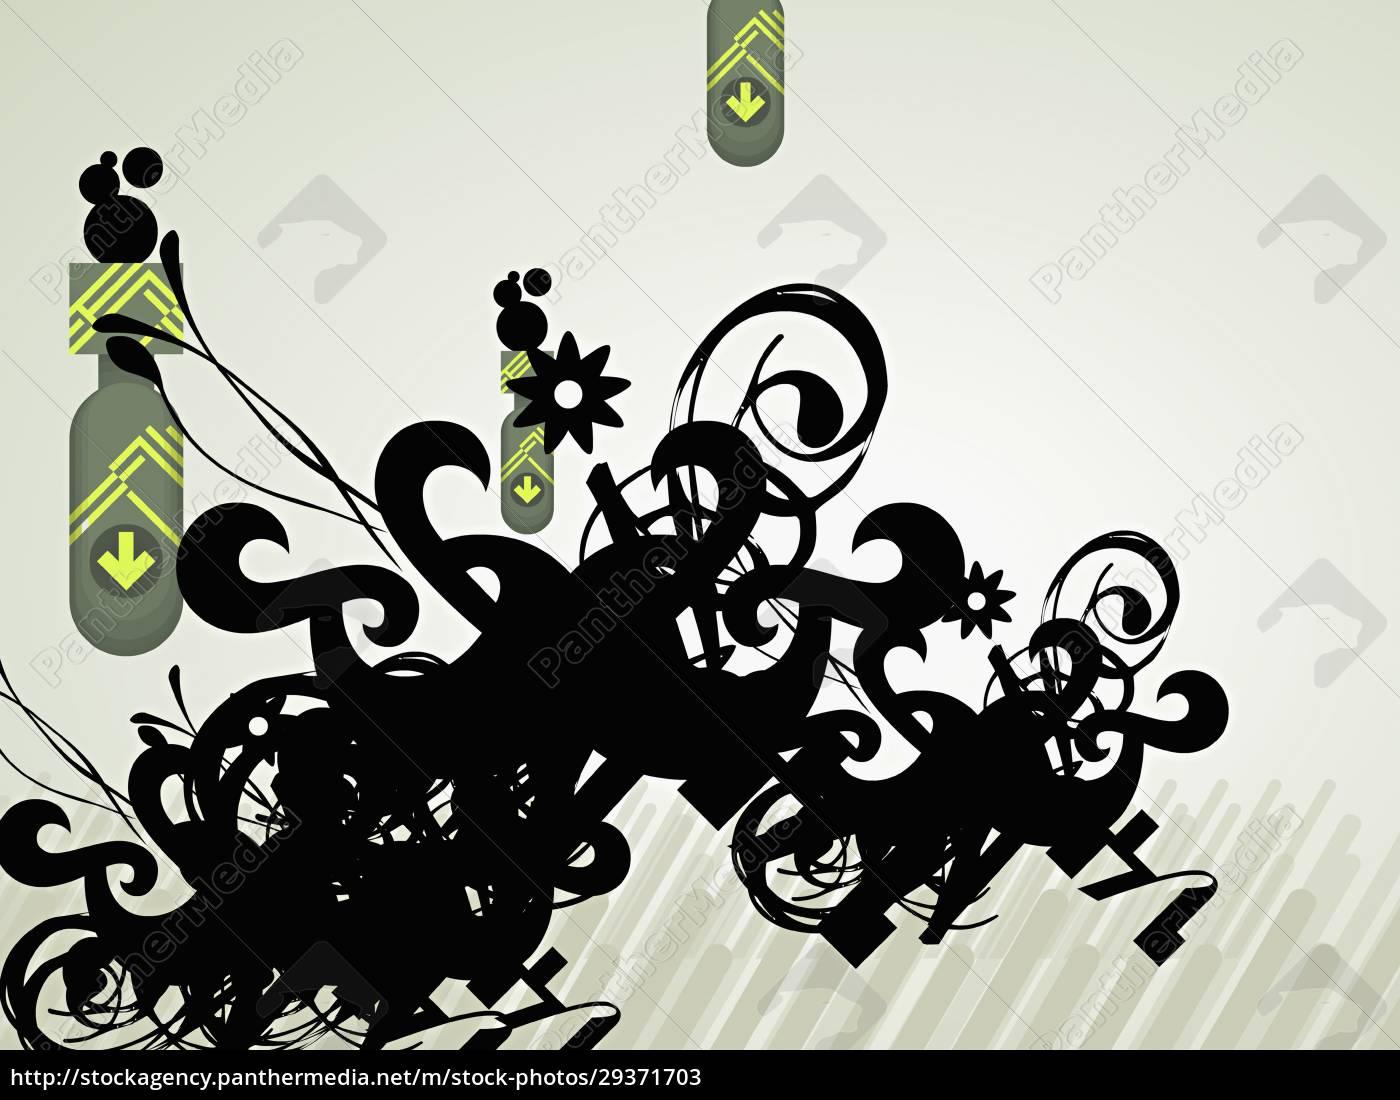 abstraktes, design - 29371703